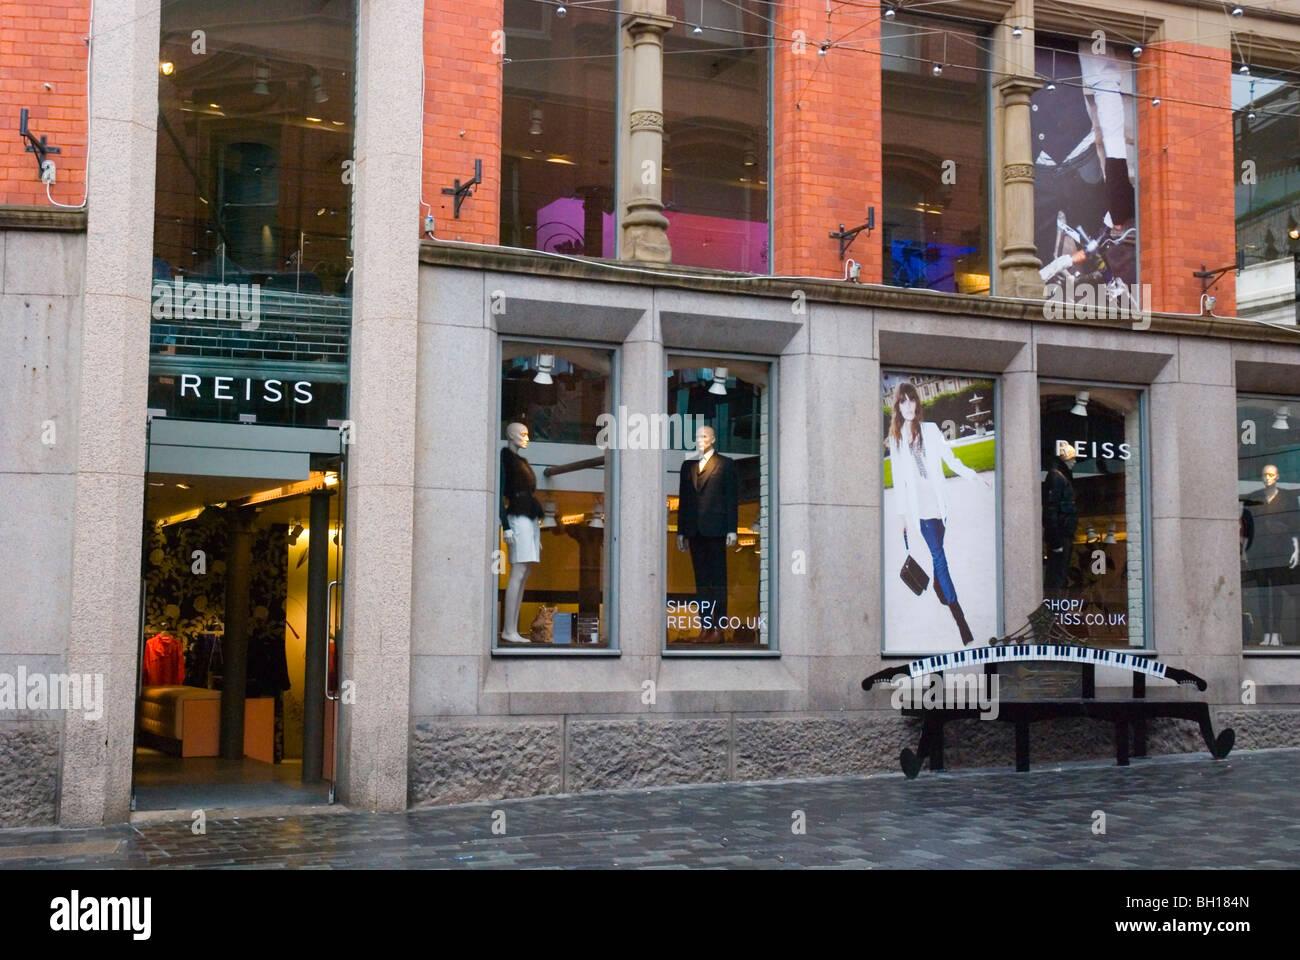 Image of Clothing shops Brick Lane area Shoreditch East End London